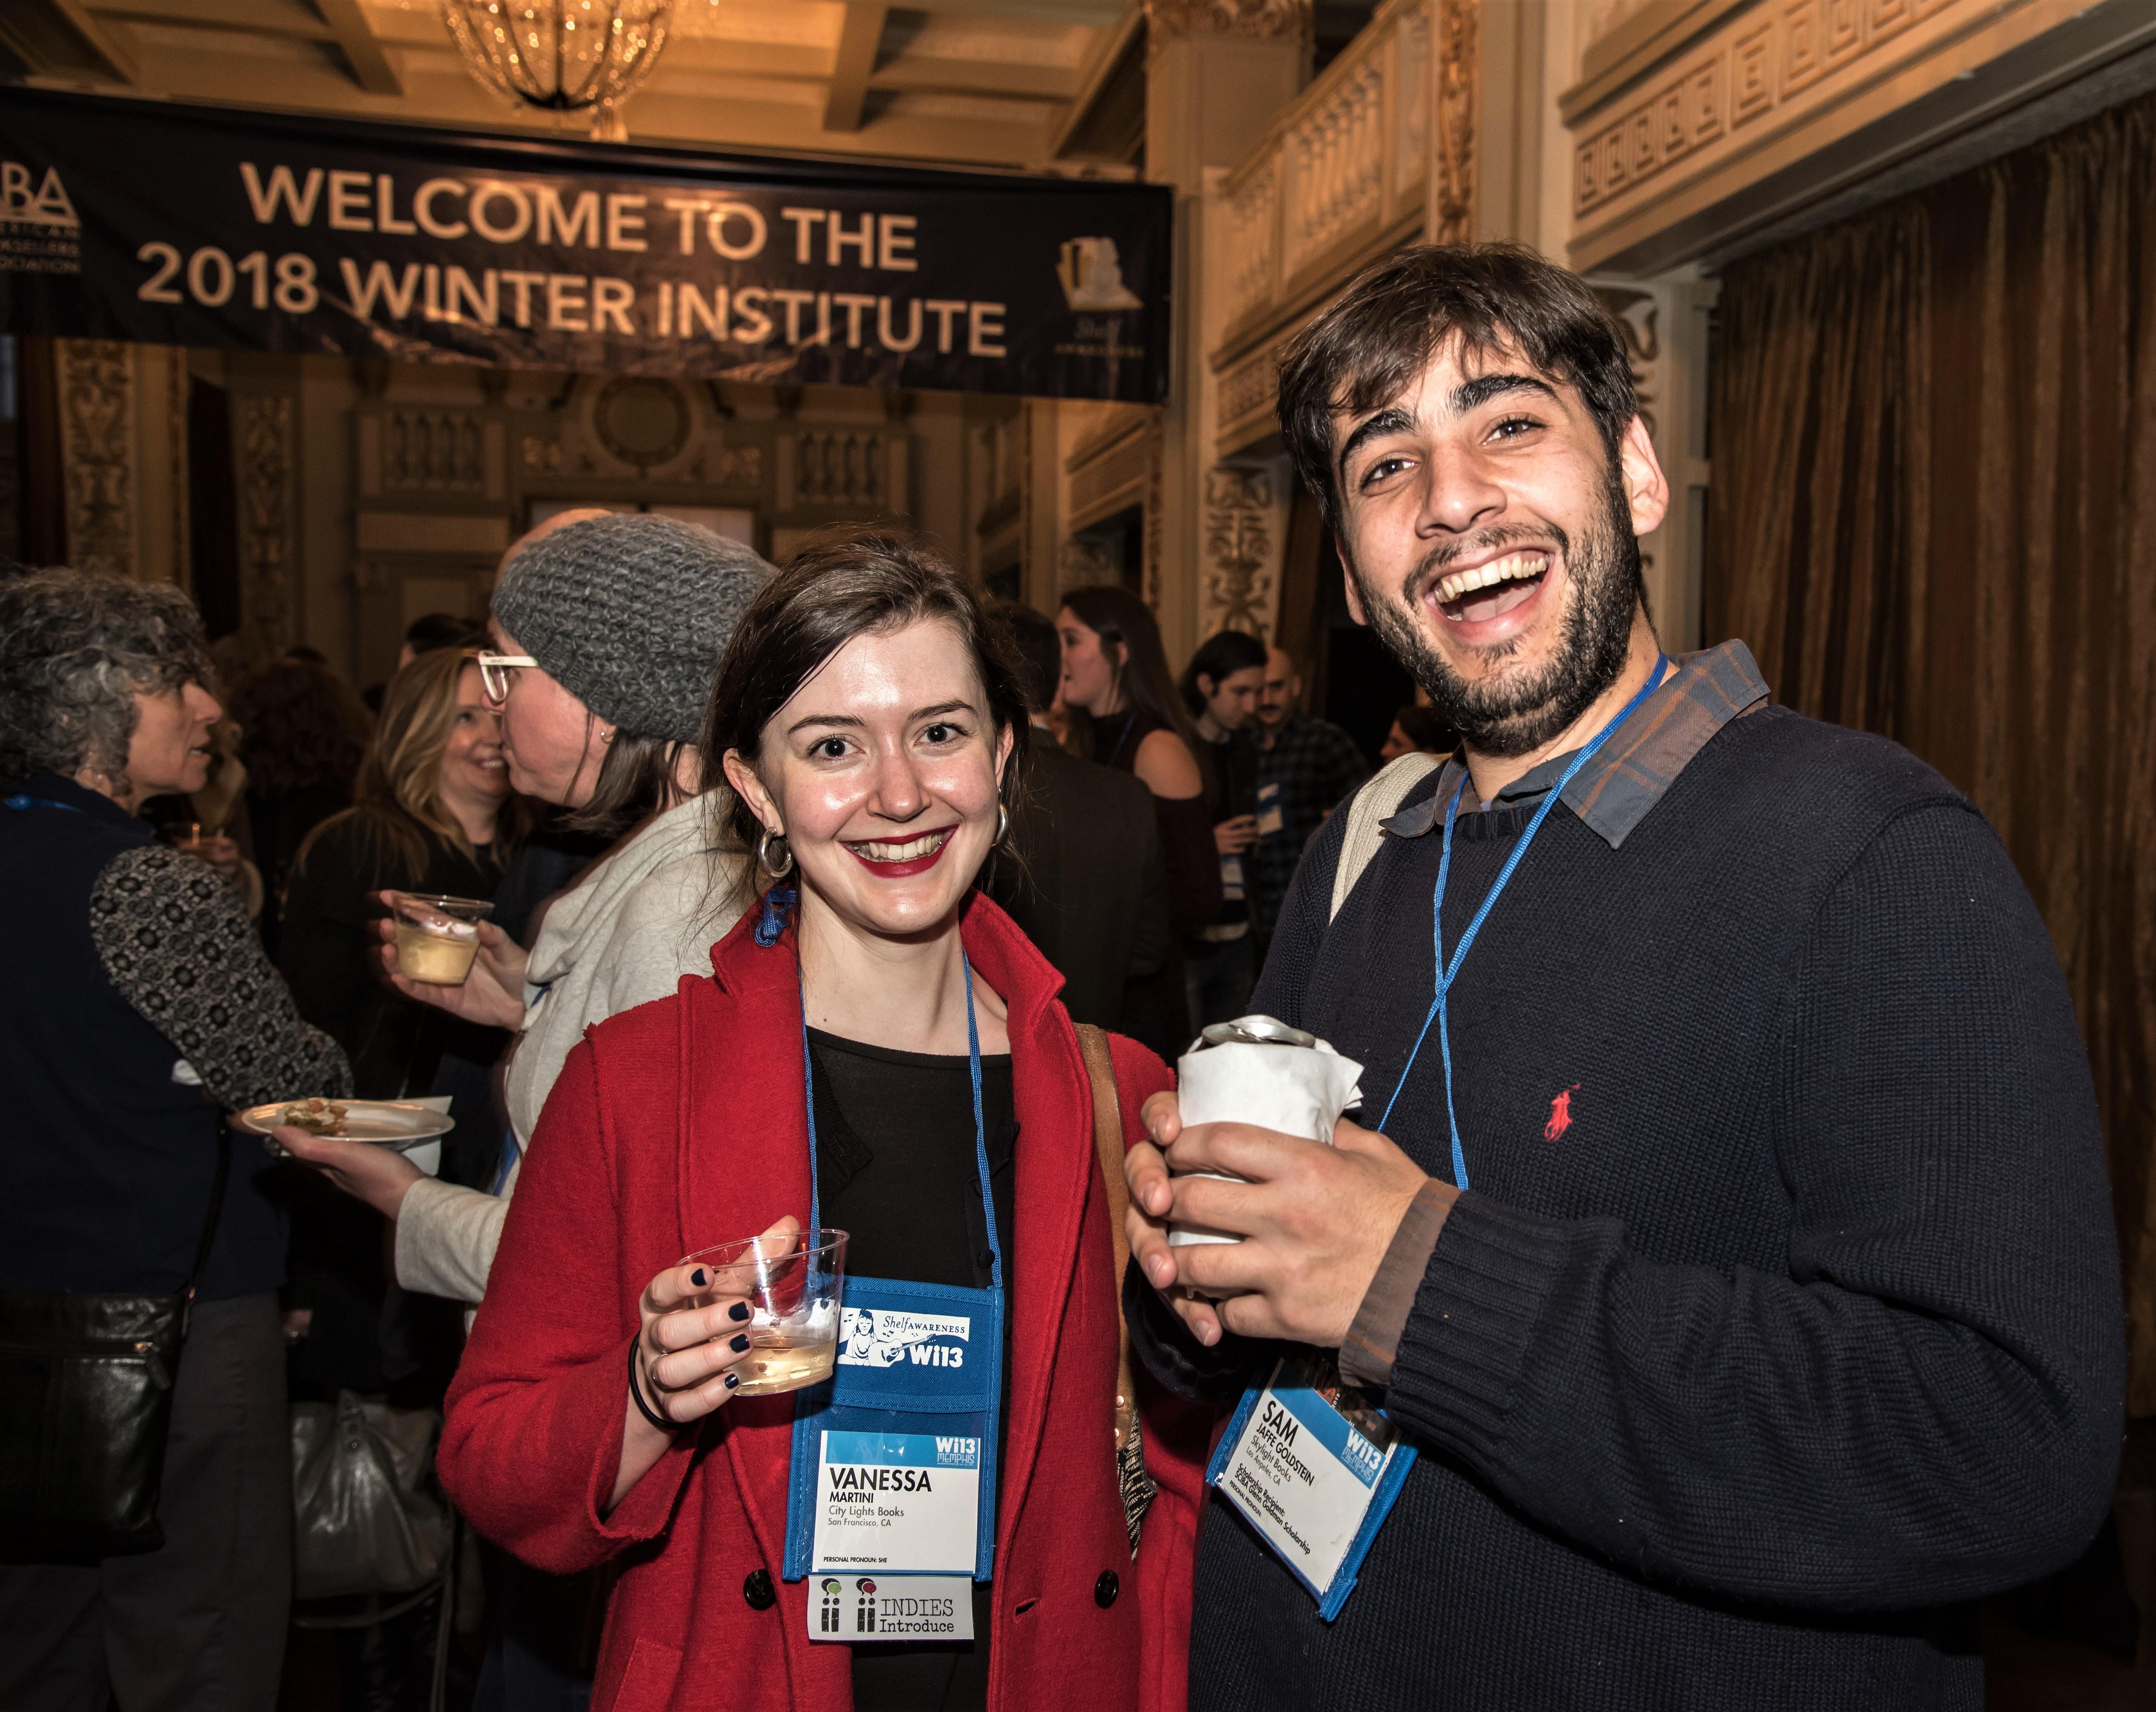 Sam Jaffee Goldstein of Skylight Books socializes with Vanessa Martini of City Lights Books.